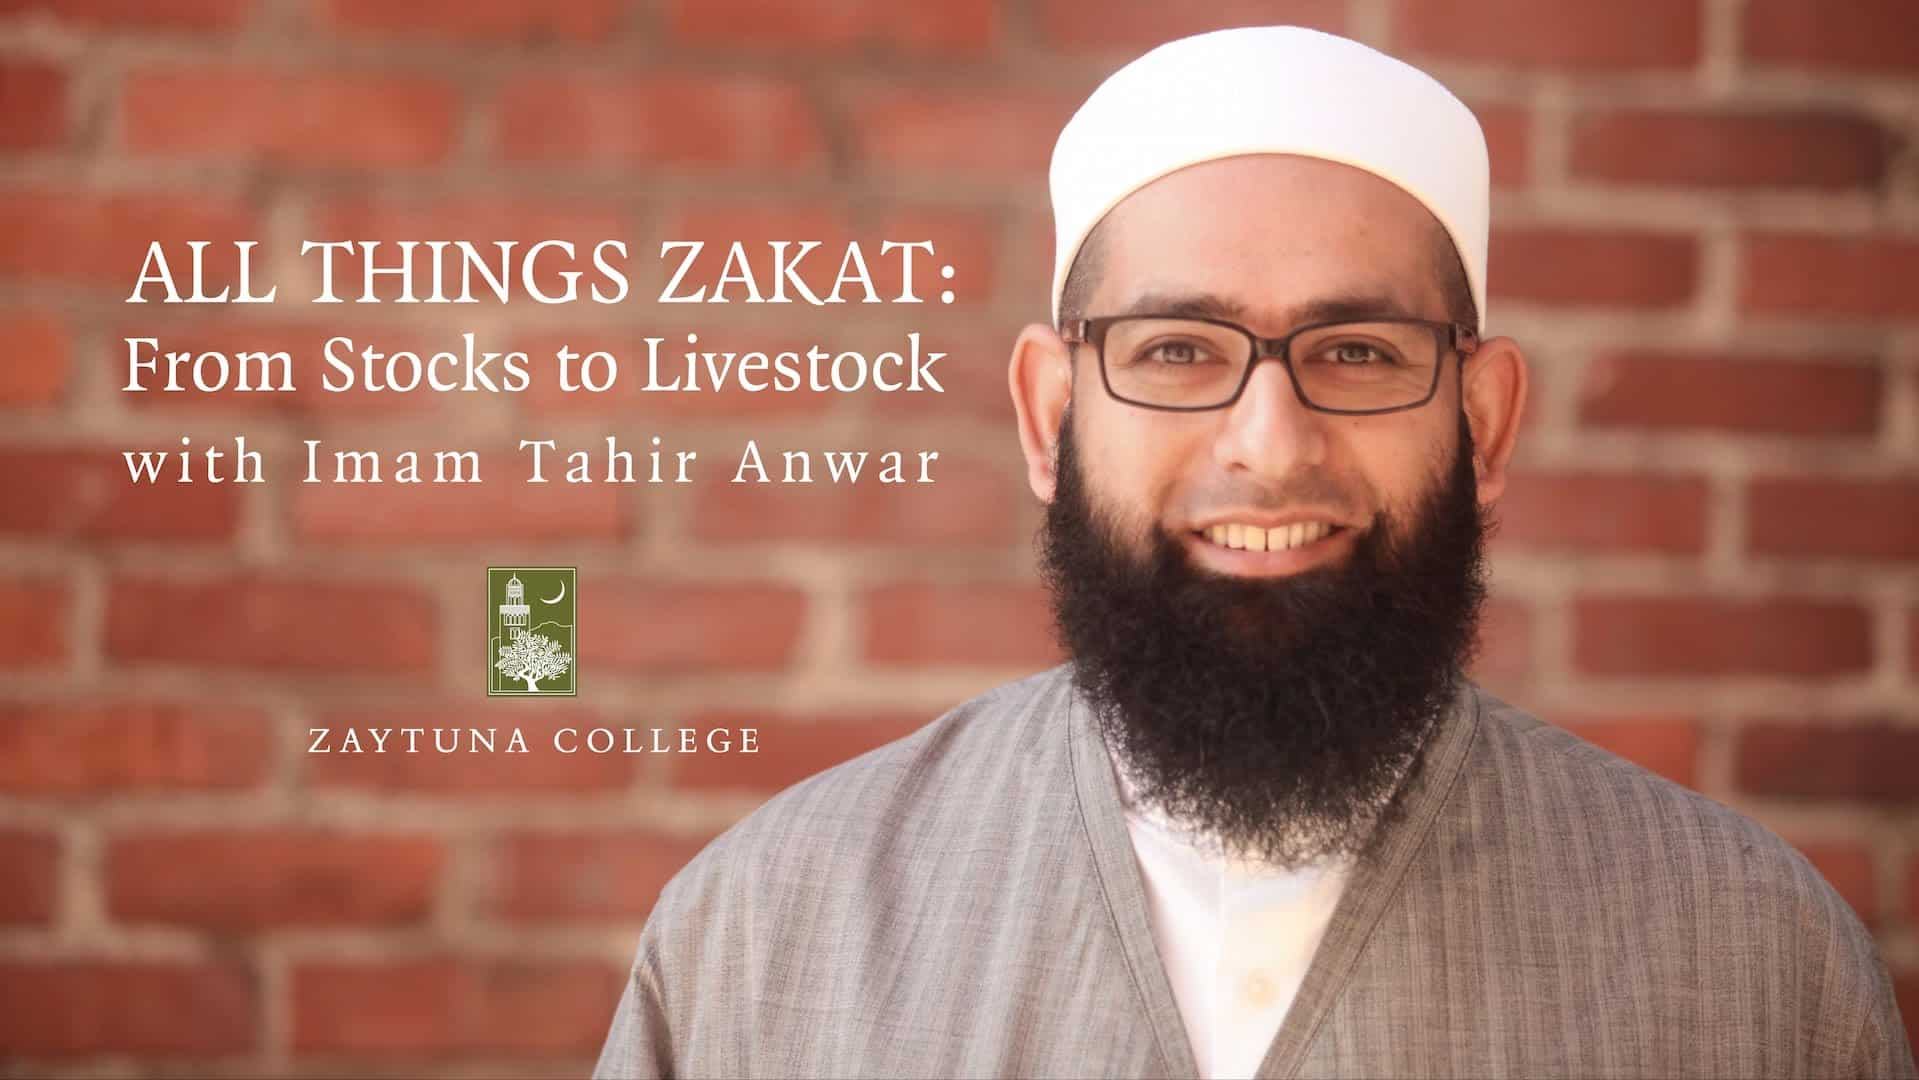 Tahir Anwar – All Things Zakat: From Stocks to Livestock